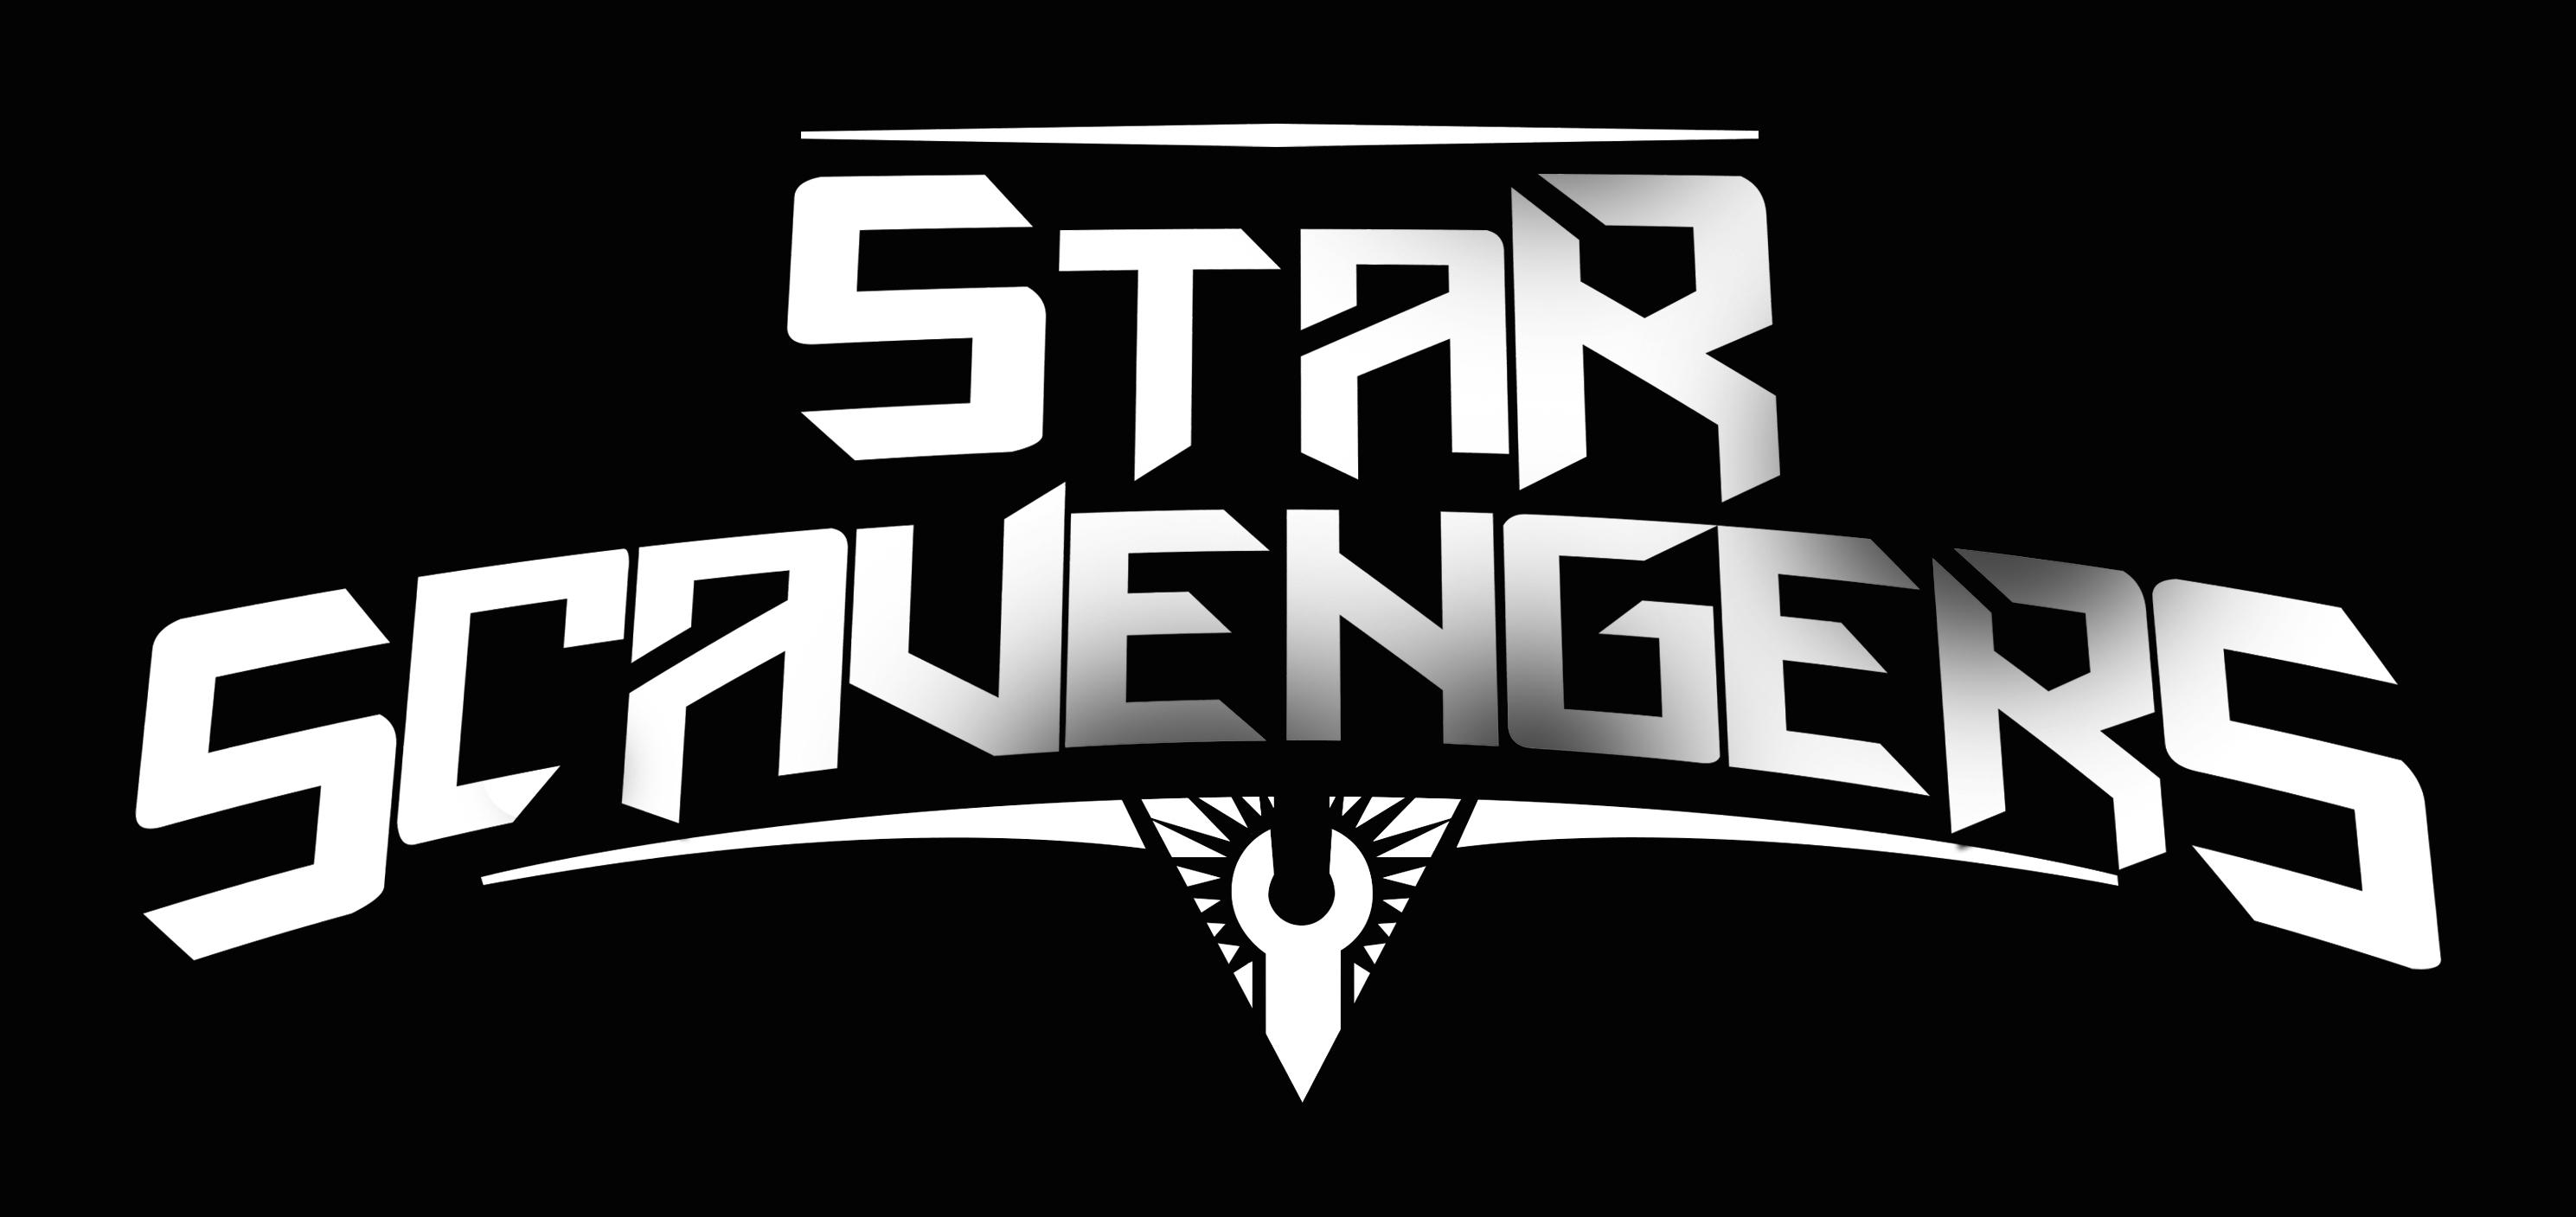 Starscavengers shadedwhiteonblack 20banner